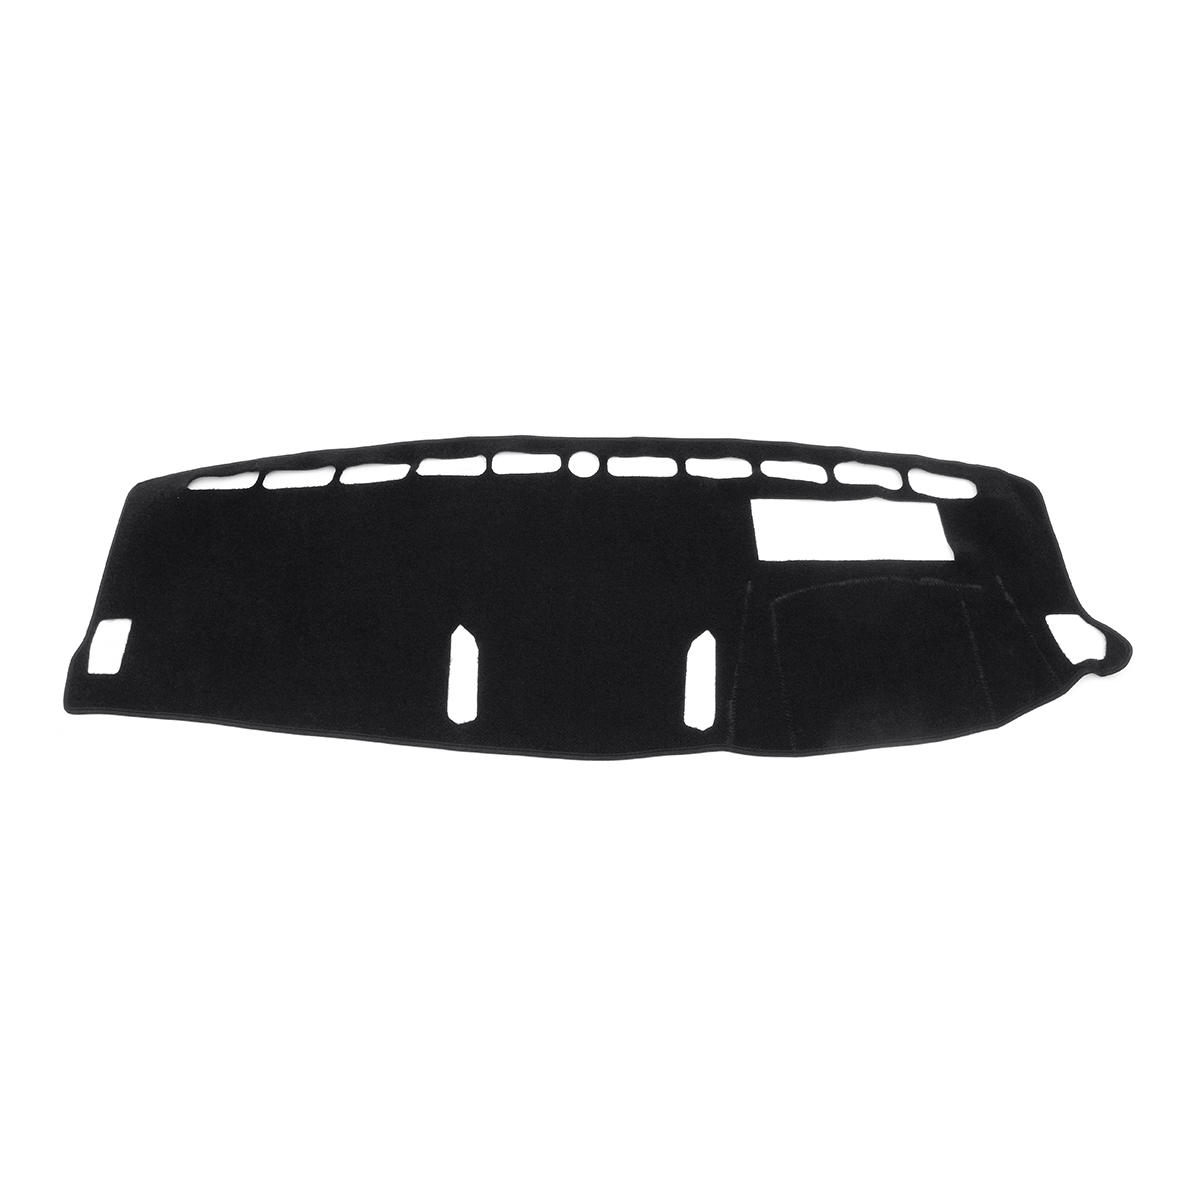 Right Dashboard Dash Mat For FORD RANGER PX2 MK2 MK3 XLT 6/2015-19